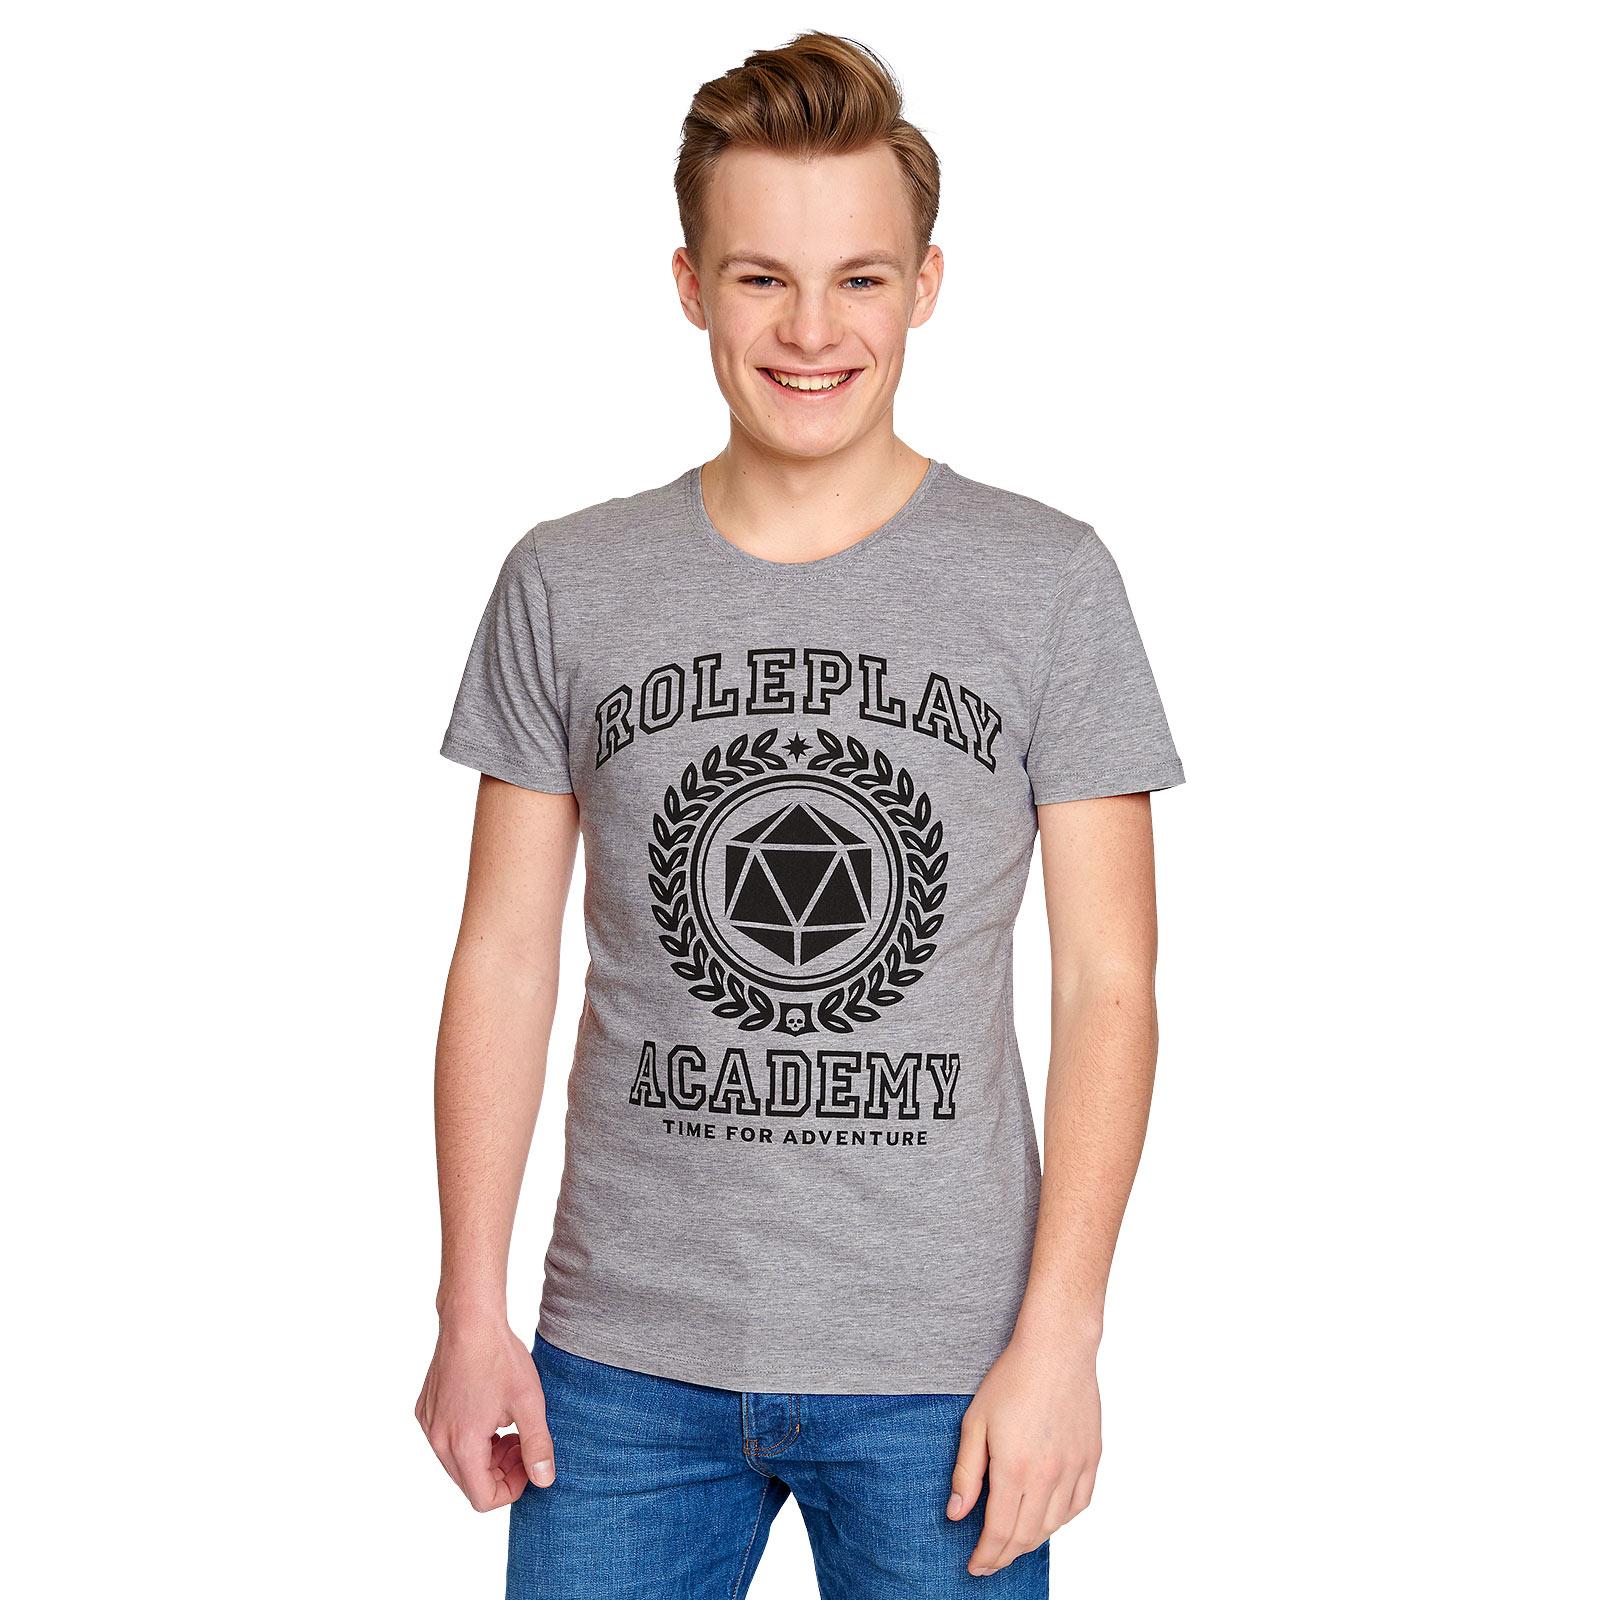 Roleplay Academy T-Shirt grau